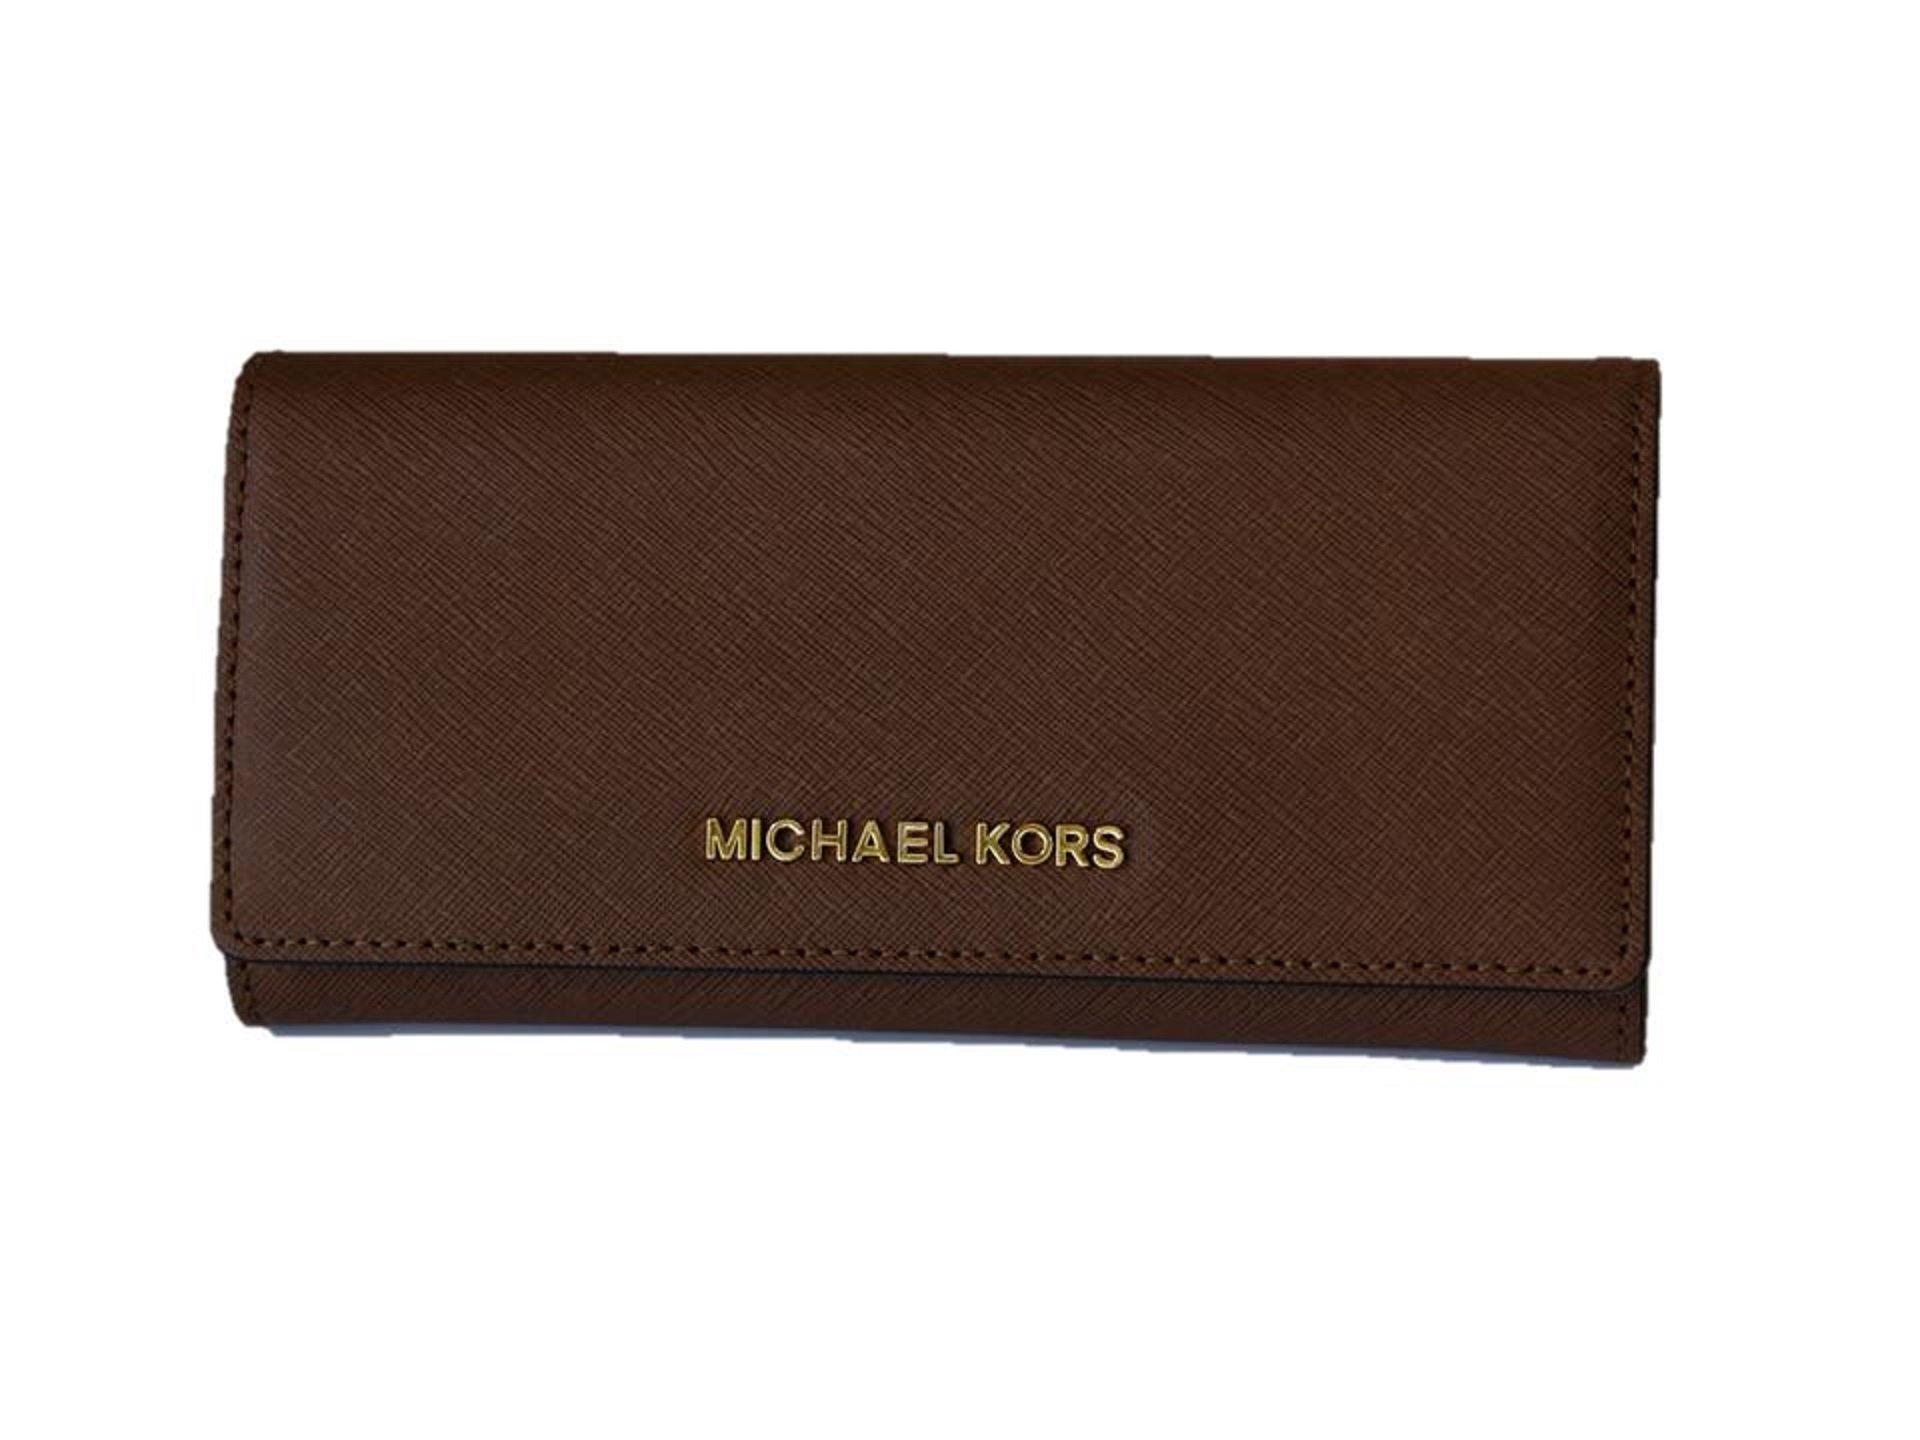 Michael Kors Jet Set Travel Saffiano Leather Carryall Wallet